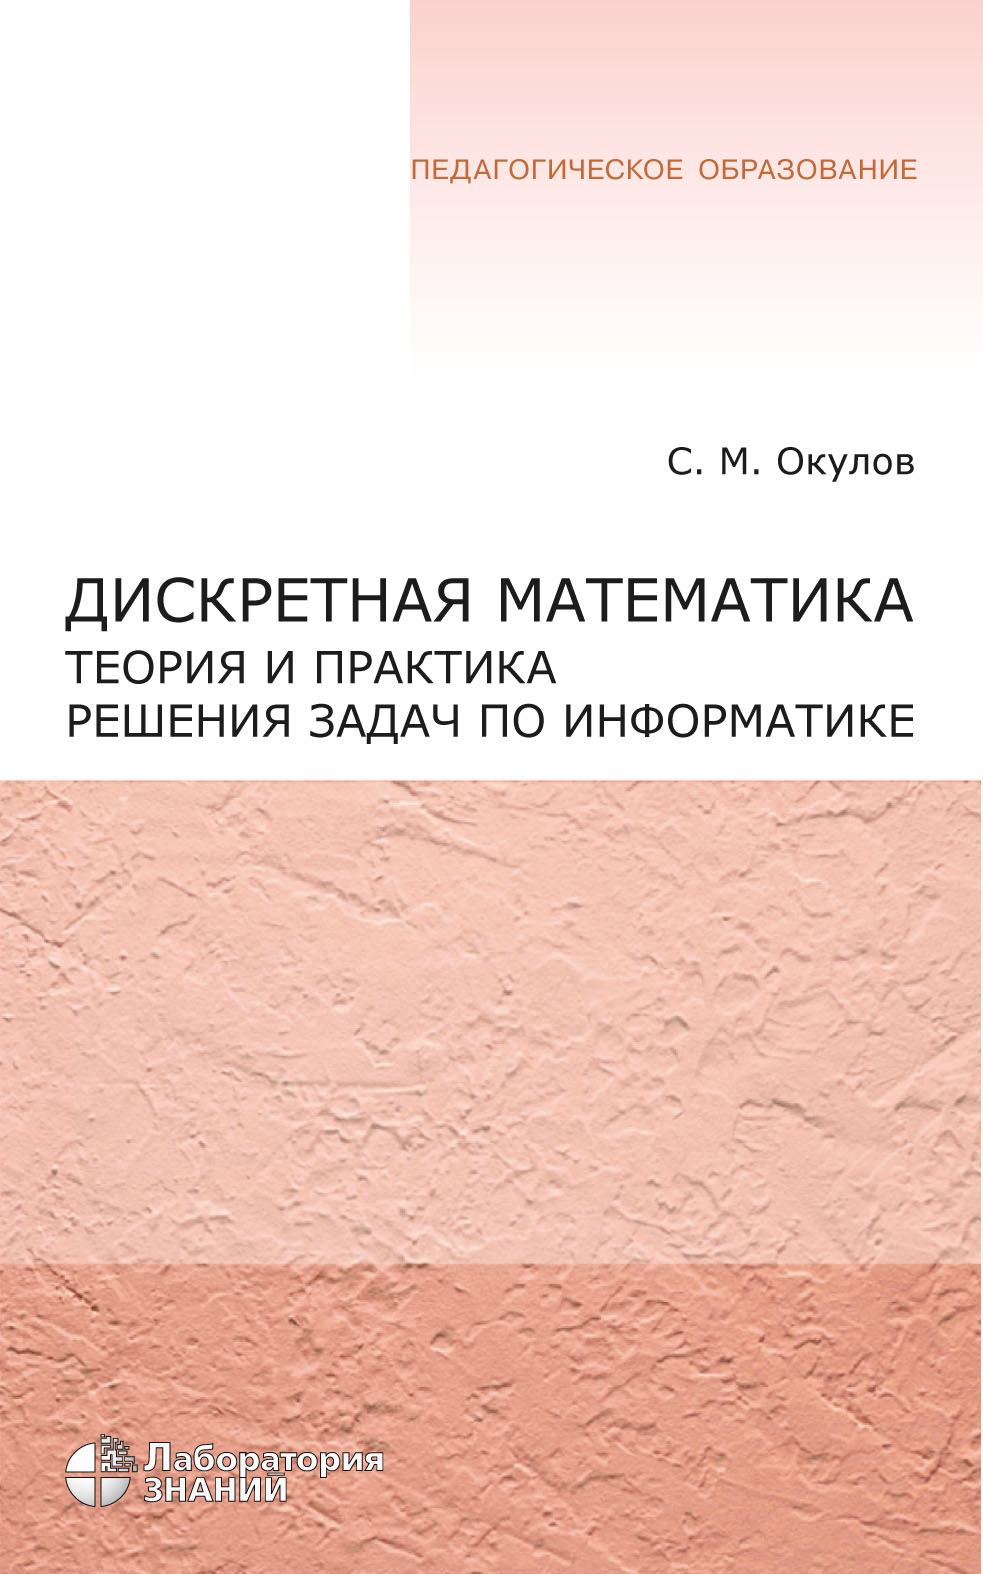 С. М. Окулов Дискретная математика. Теория и практика решения задач по информатике